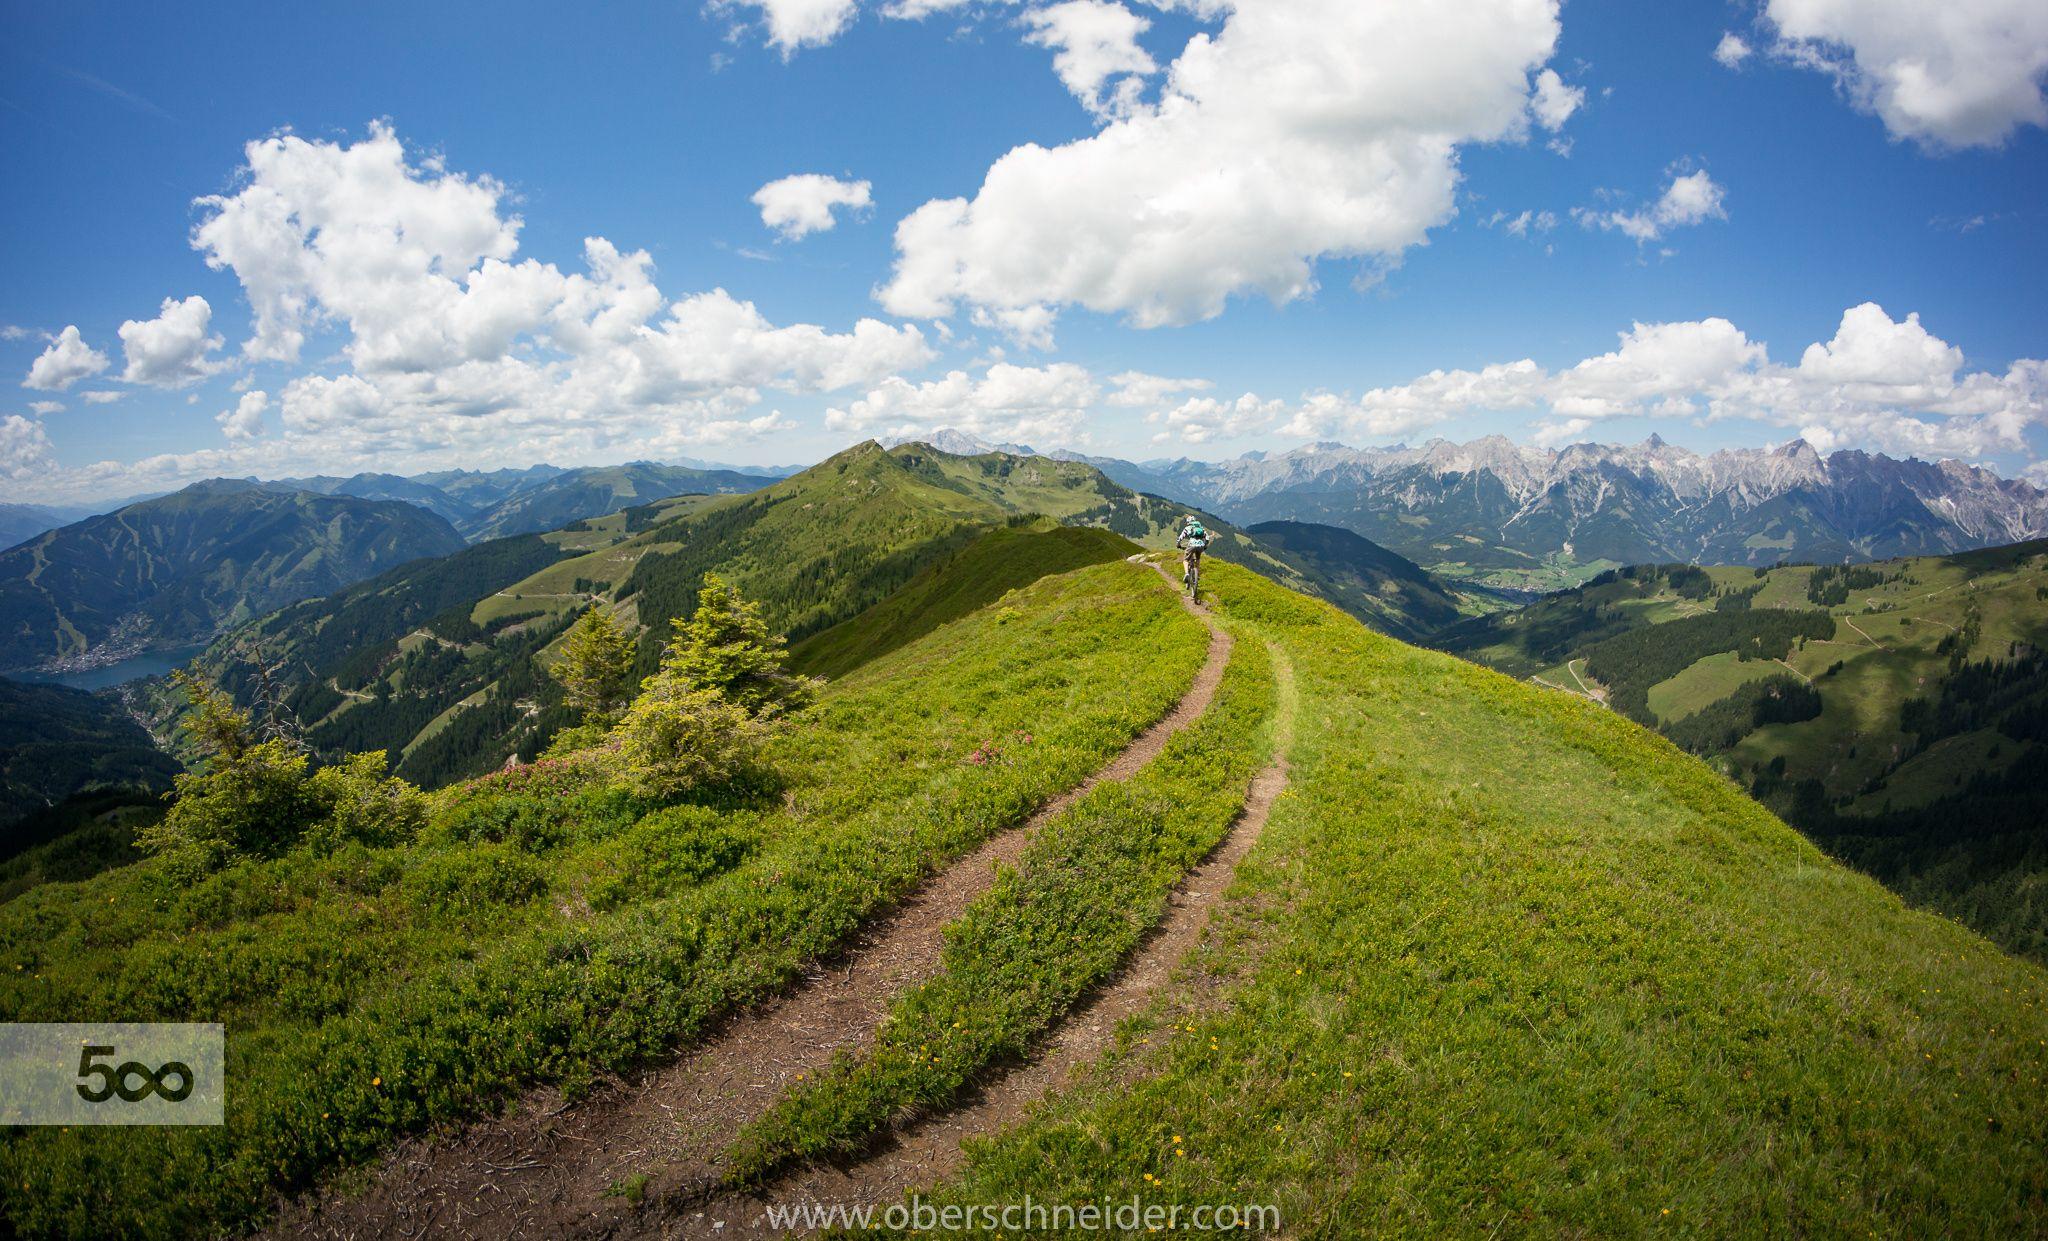 Endless Singletrail Mountainbiking in Austria by Christoph Oberschneider on 500px